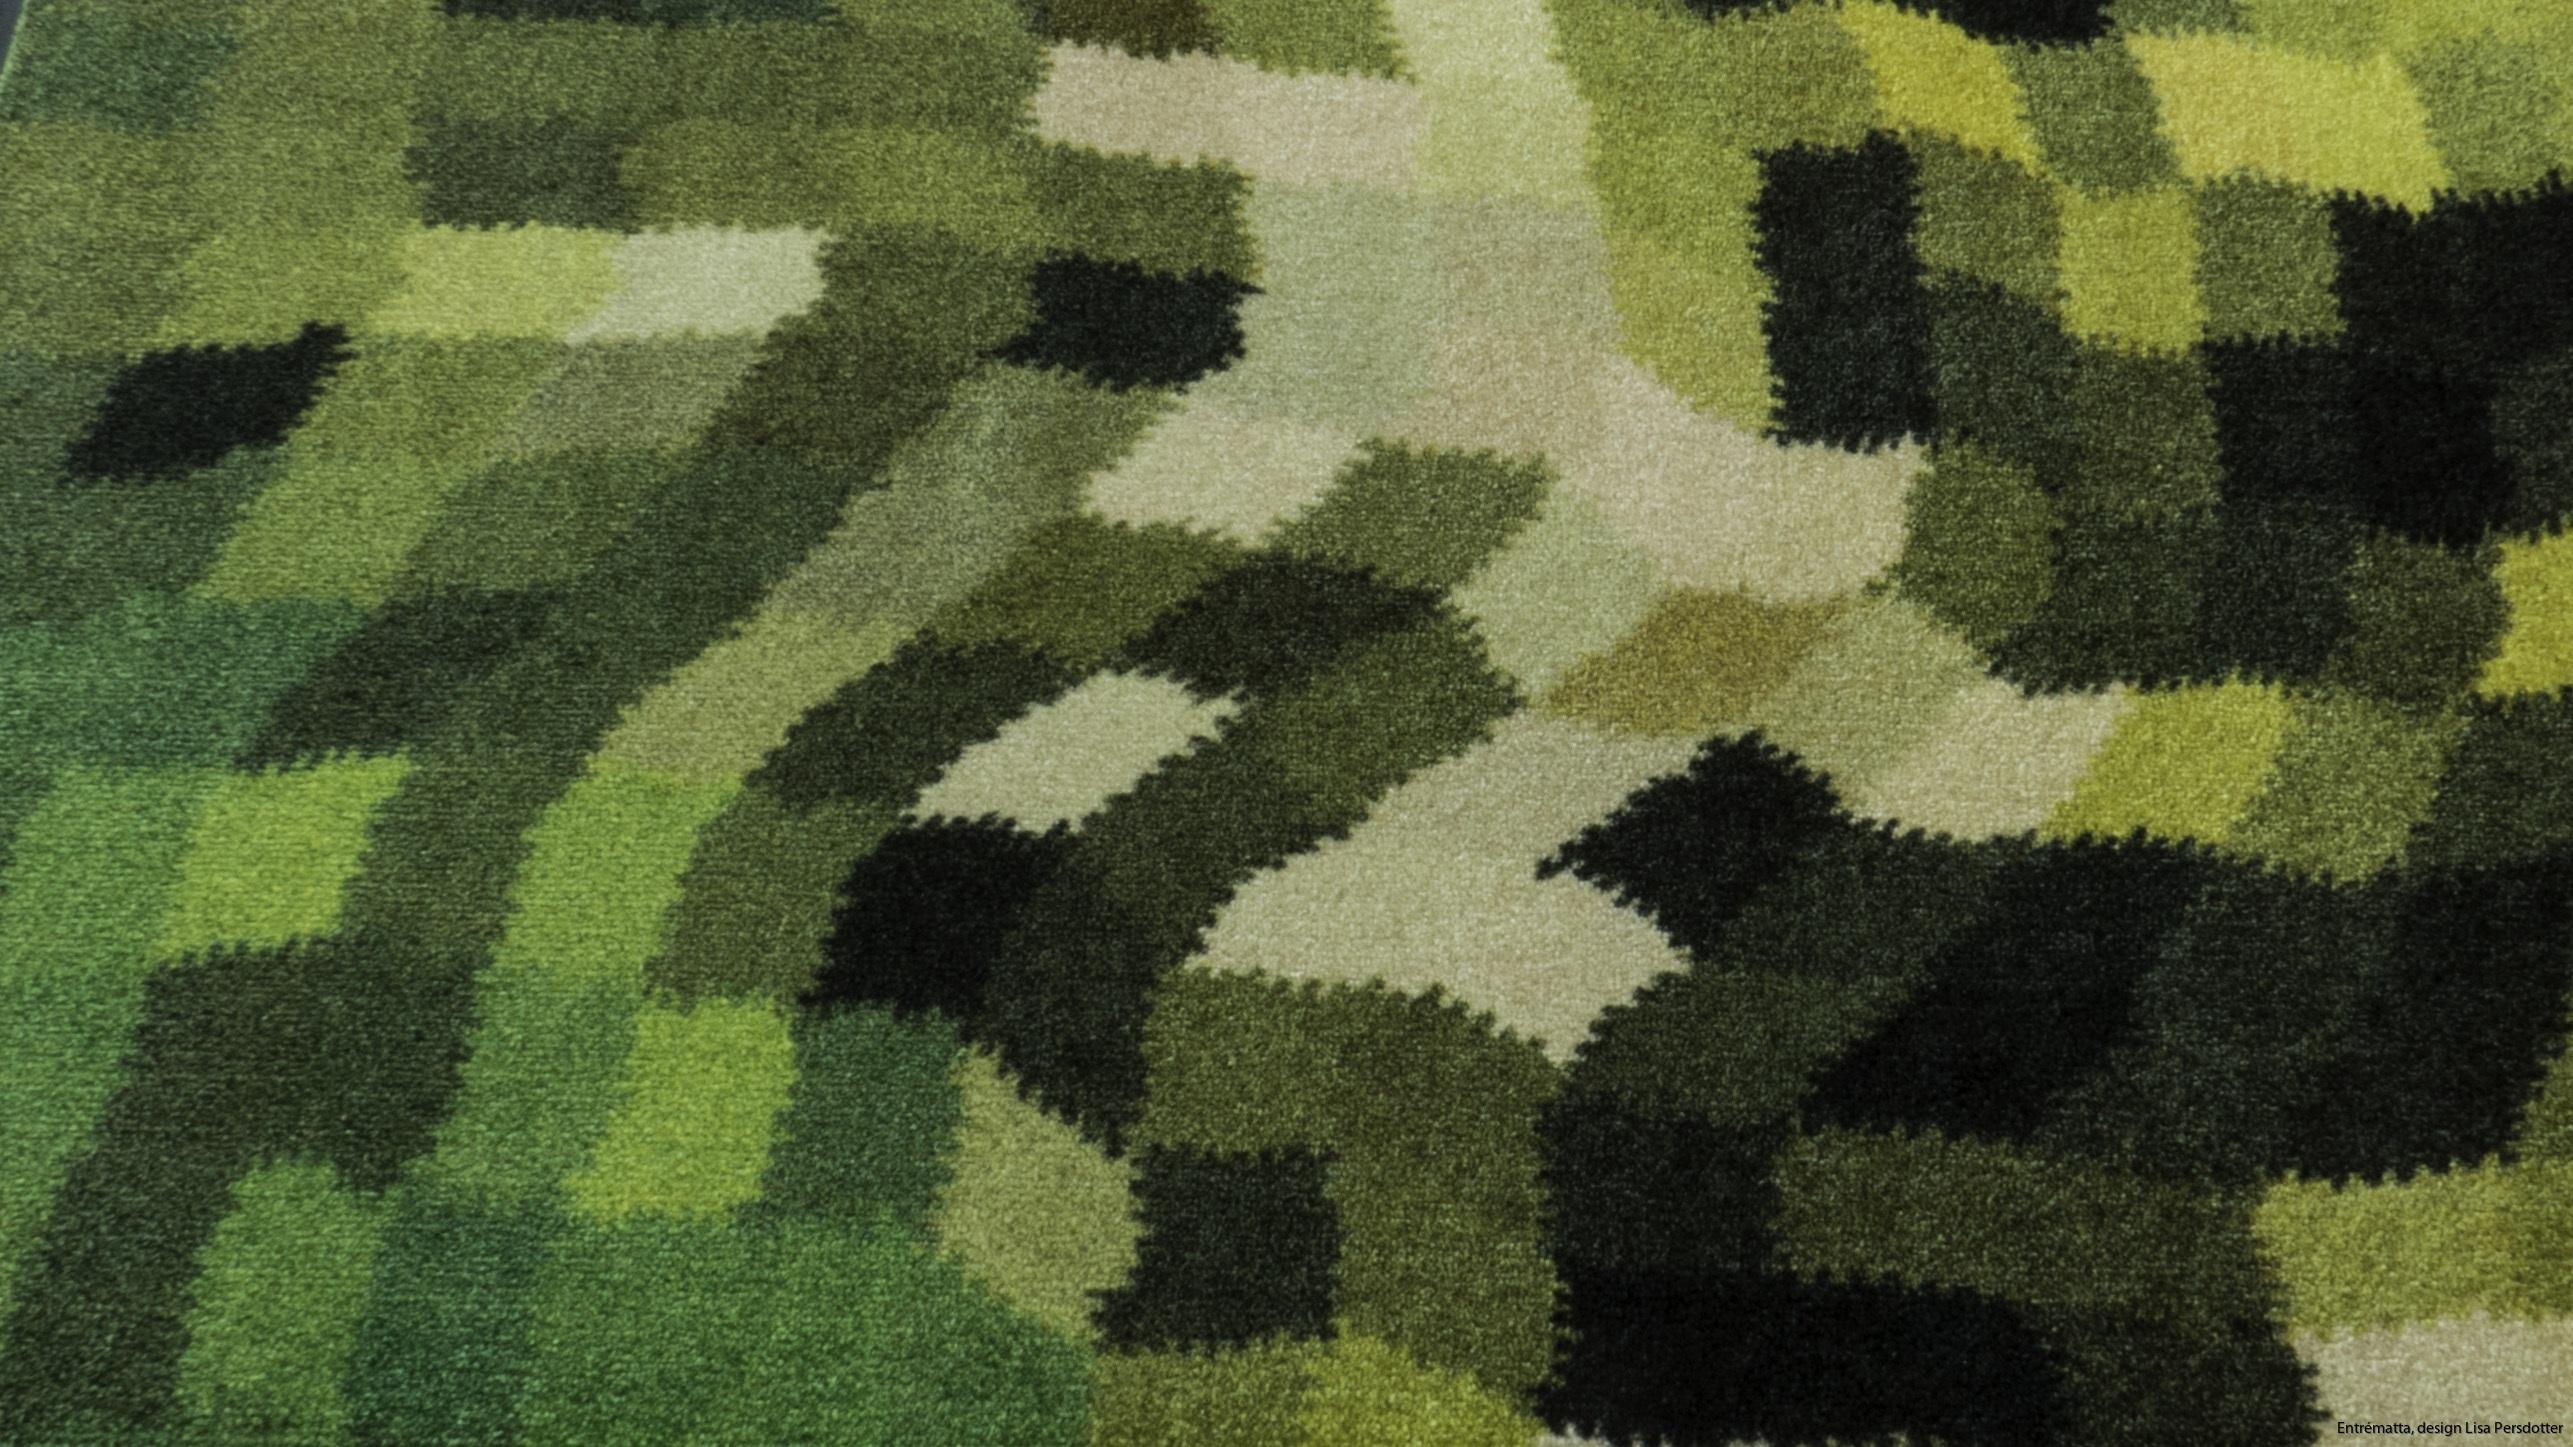 Hallmatta grön mönstrad Lisa Persdotter colorjoy.se